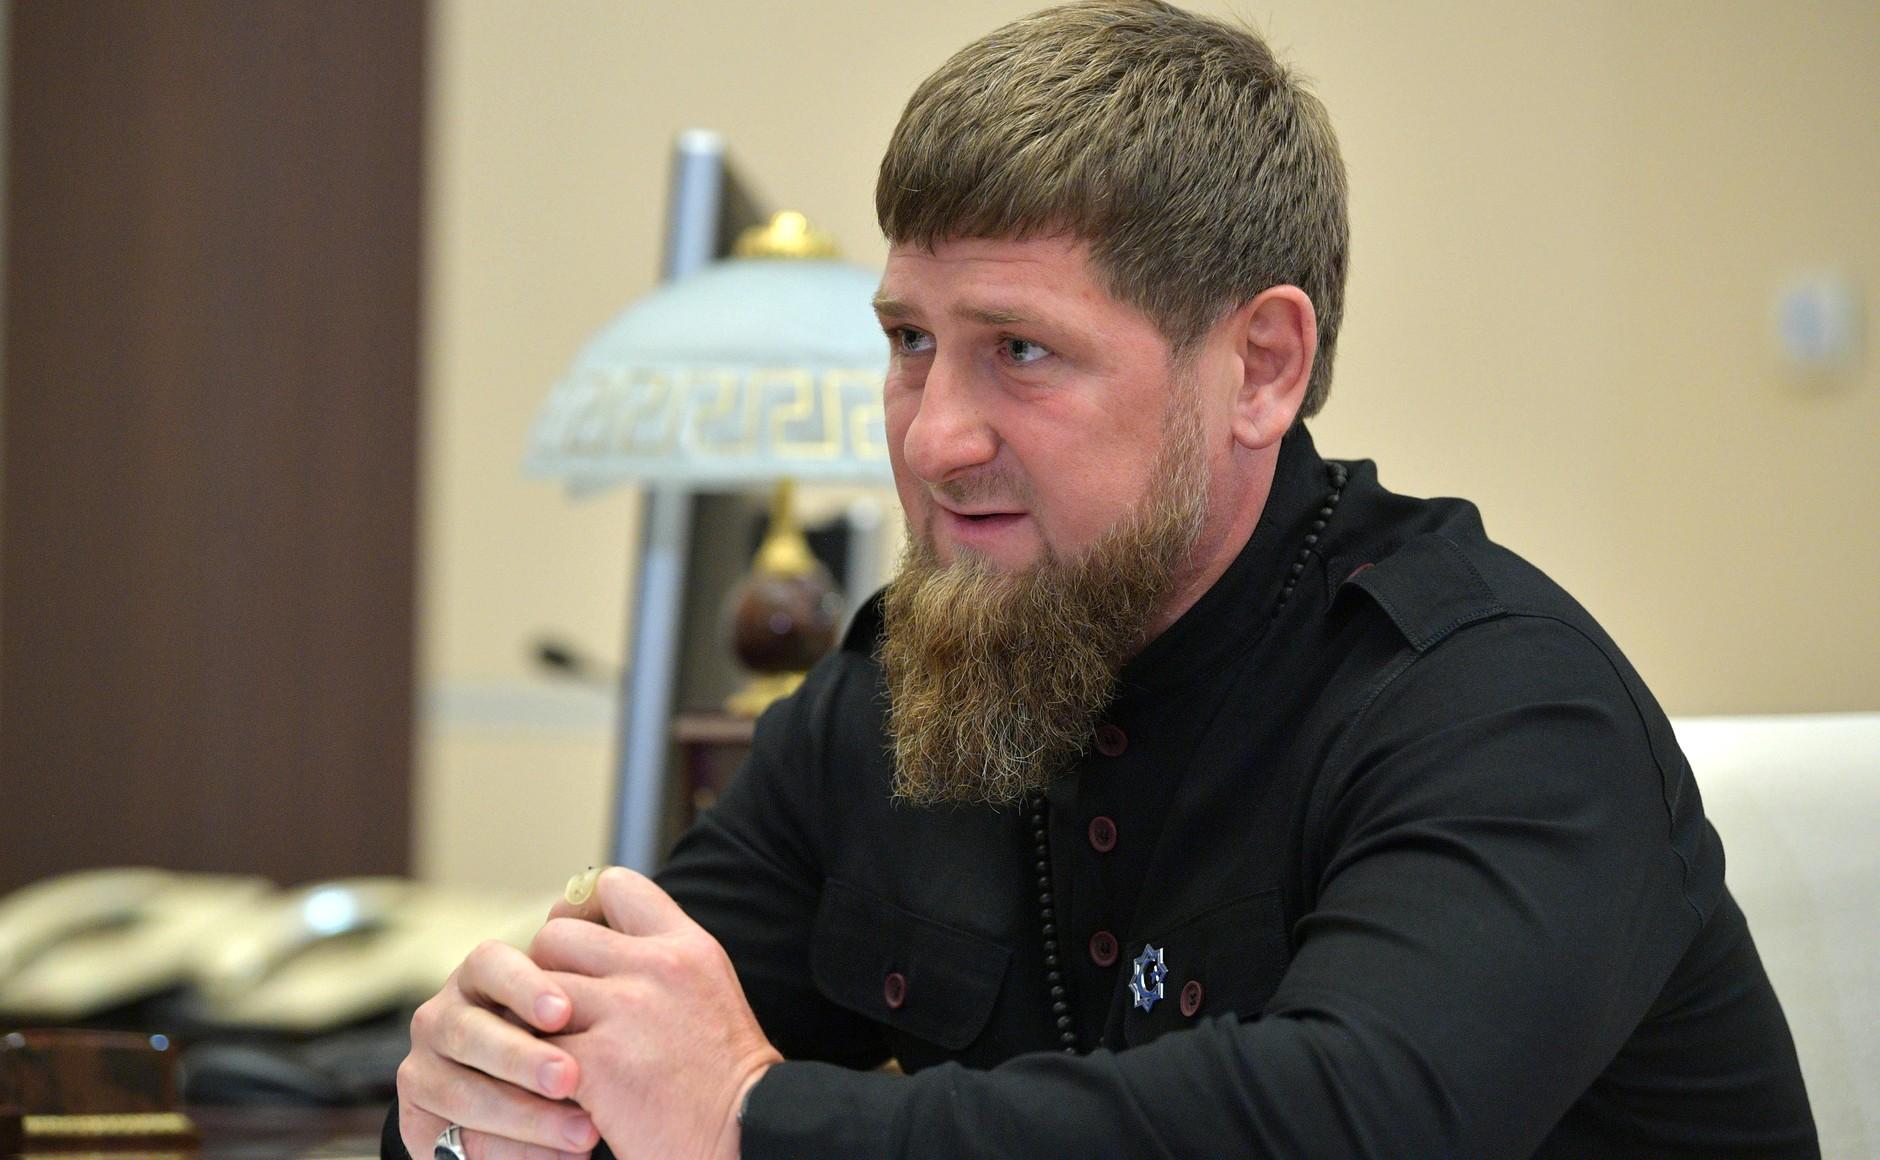 Ramzan Kadryov, the leader of Chechnya, pictured in 2018 (Wikimedia Commons).